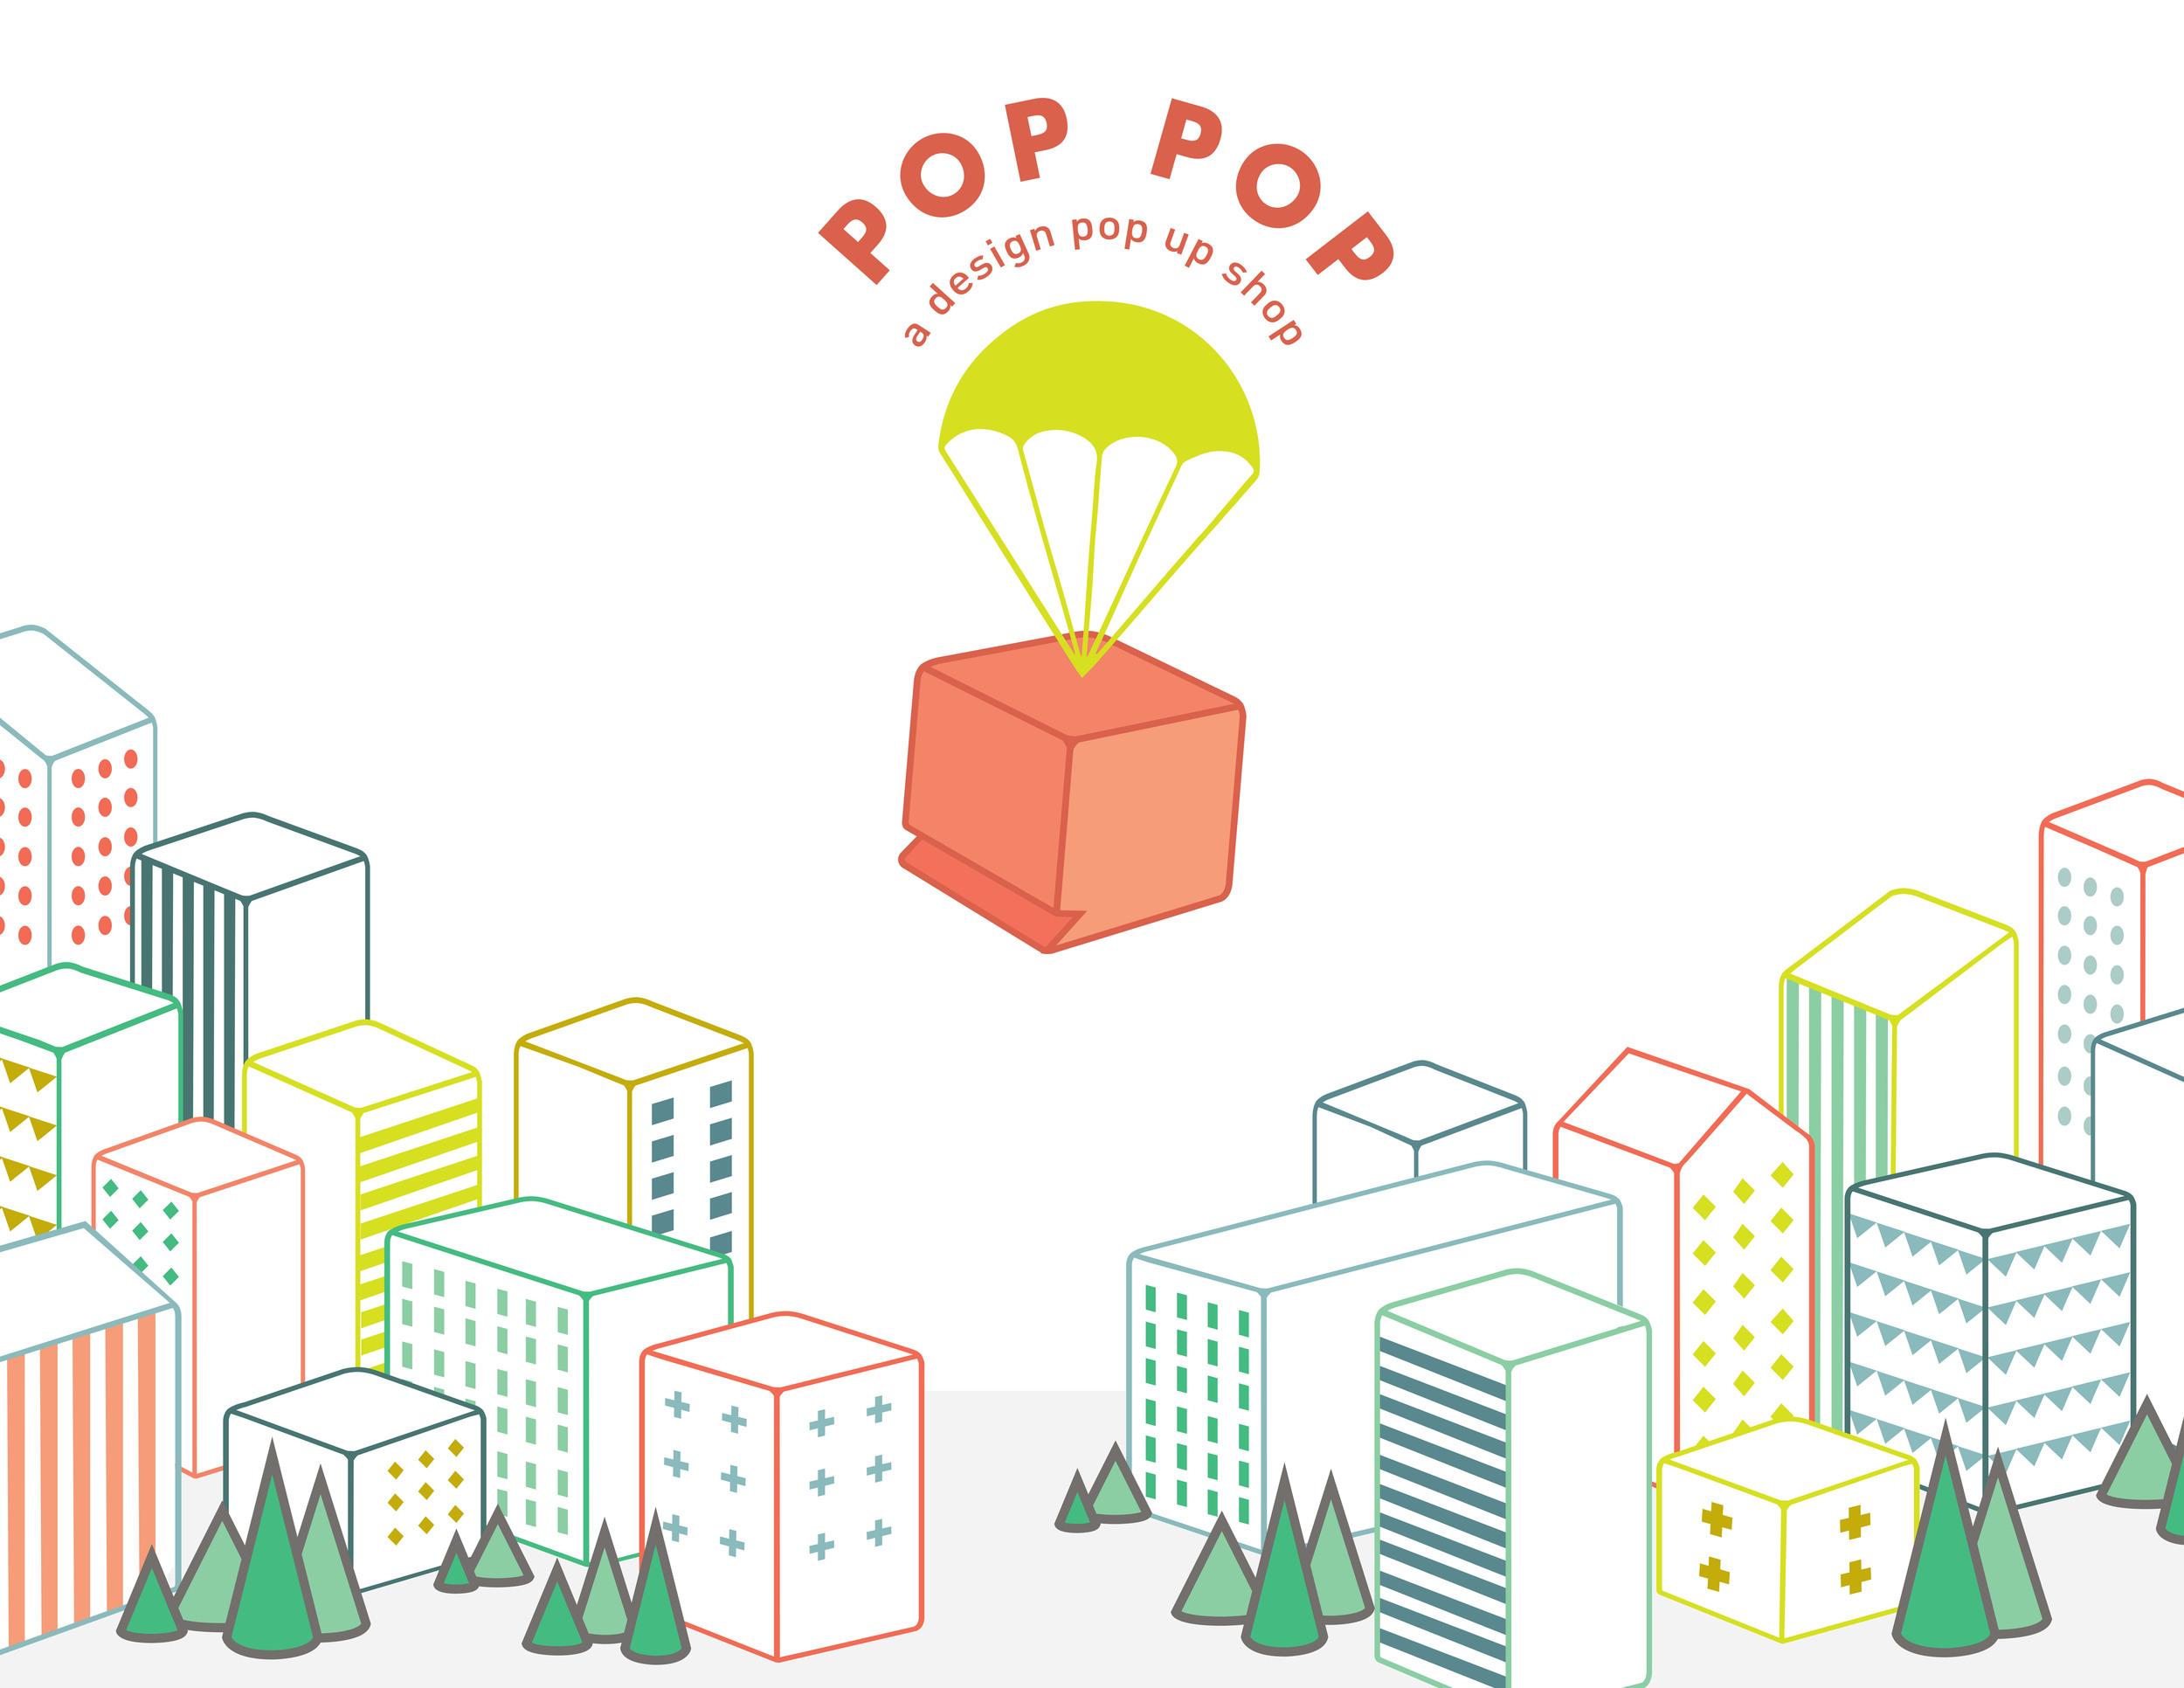 PopPopcityscape.jpg